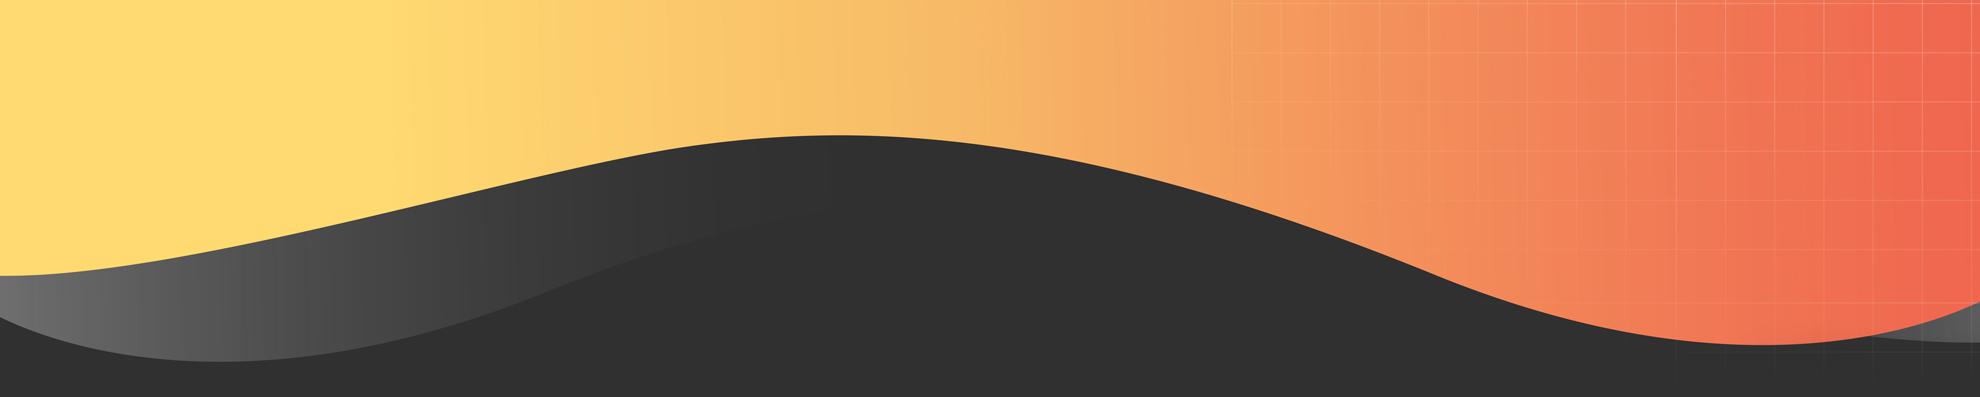 top-b-官方網頁設計,官方網站設計, 品牌網站設計, 網站設計, 網頁設計, 響應式網頁設計, 公司網站設計, 公司網站, 產品網站, LOGO設計, 設計LOGO, 設計品牌, 創意設計, 品牌設計, 商標設計, 平面設計, 視覺設計, 名片設計, 產品設計, 包裝設計, 網頁設計, 網站設計, CIS企業識別設計, CIS, LOGO, DESIGN, brochure, Flyertop-b_網站設計_網頁設計_響應式網頁設計_公司網站設計_公司網站_產品網站_LOGO設計_設計LOGO_設計品牌_創意設計_品牌設計_商標設計_平面設計_視覺設計_名片設計_產品設計_包裝設計_網頁設計_網站設計_CIS企業識別設計_CIS_LOGO_DESIGN_brochure_Flyer